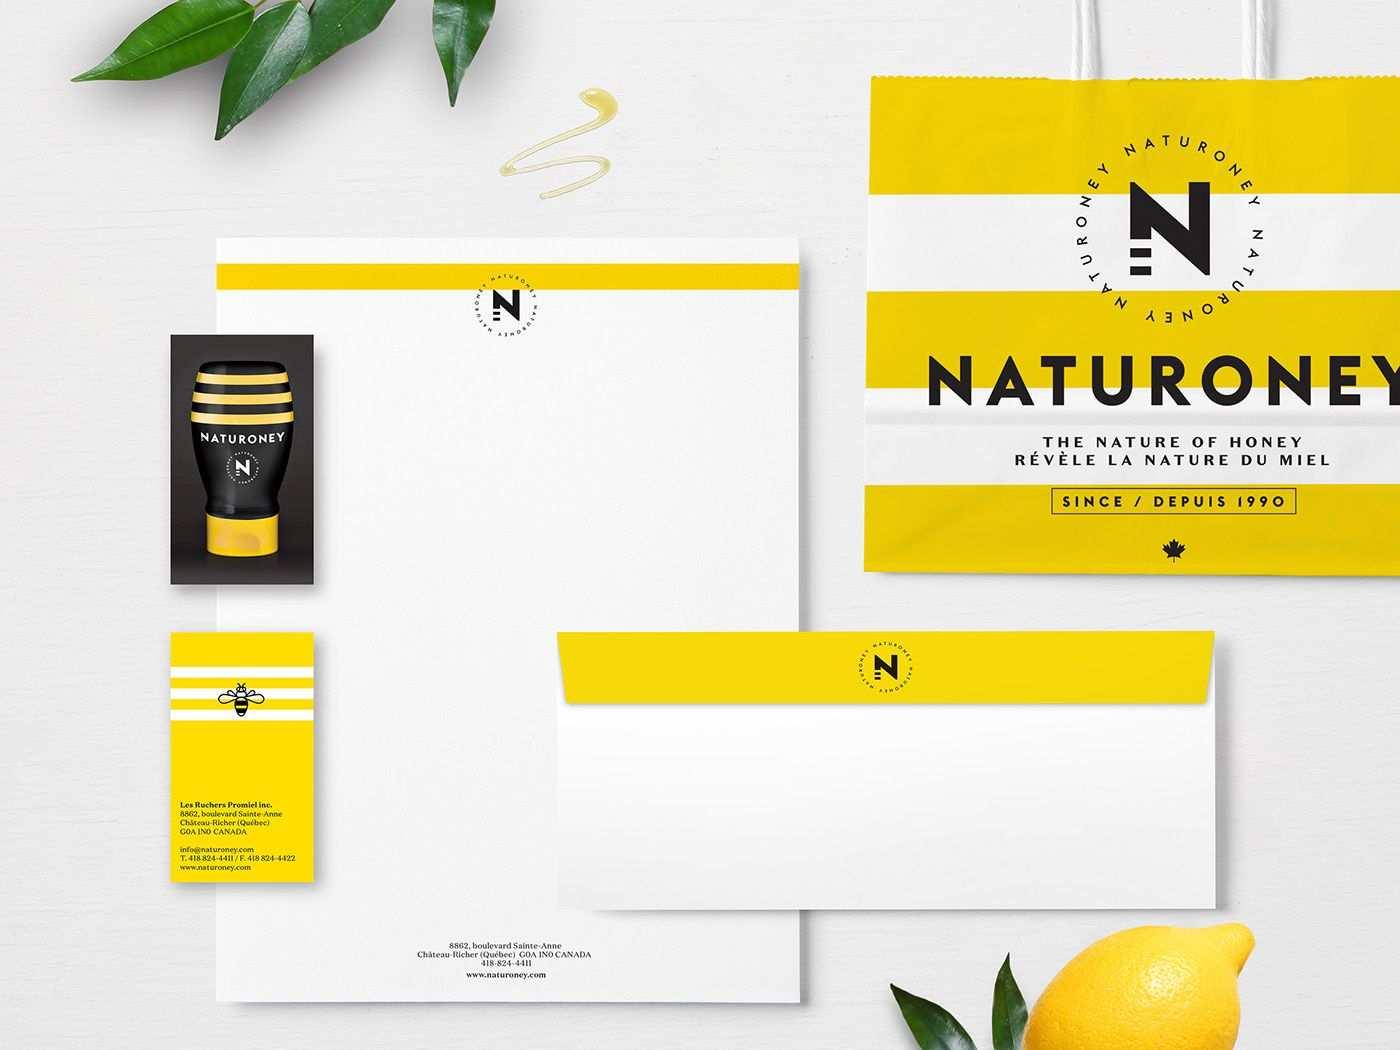 Naturoney The Nature Of Honey On Behance Honey Brand Creative Packaging Design Identity